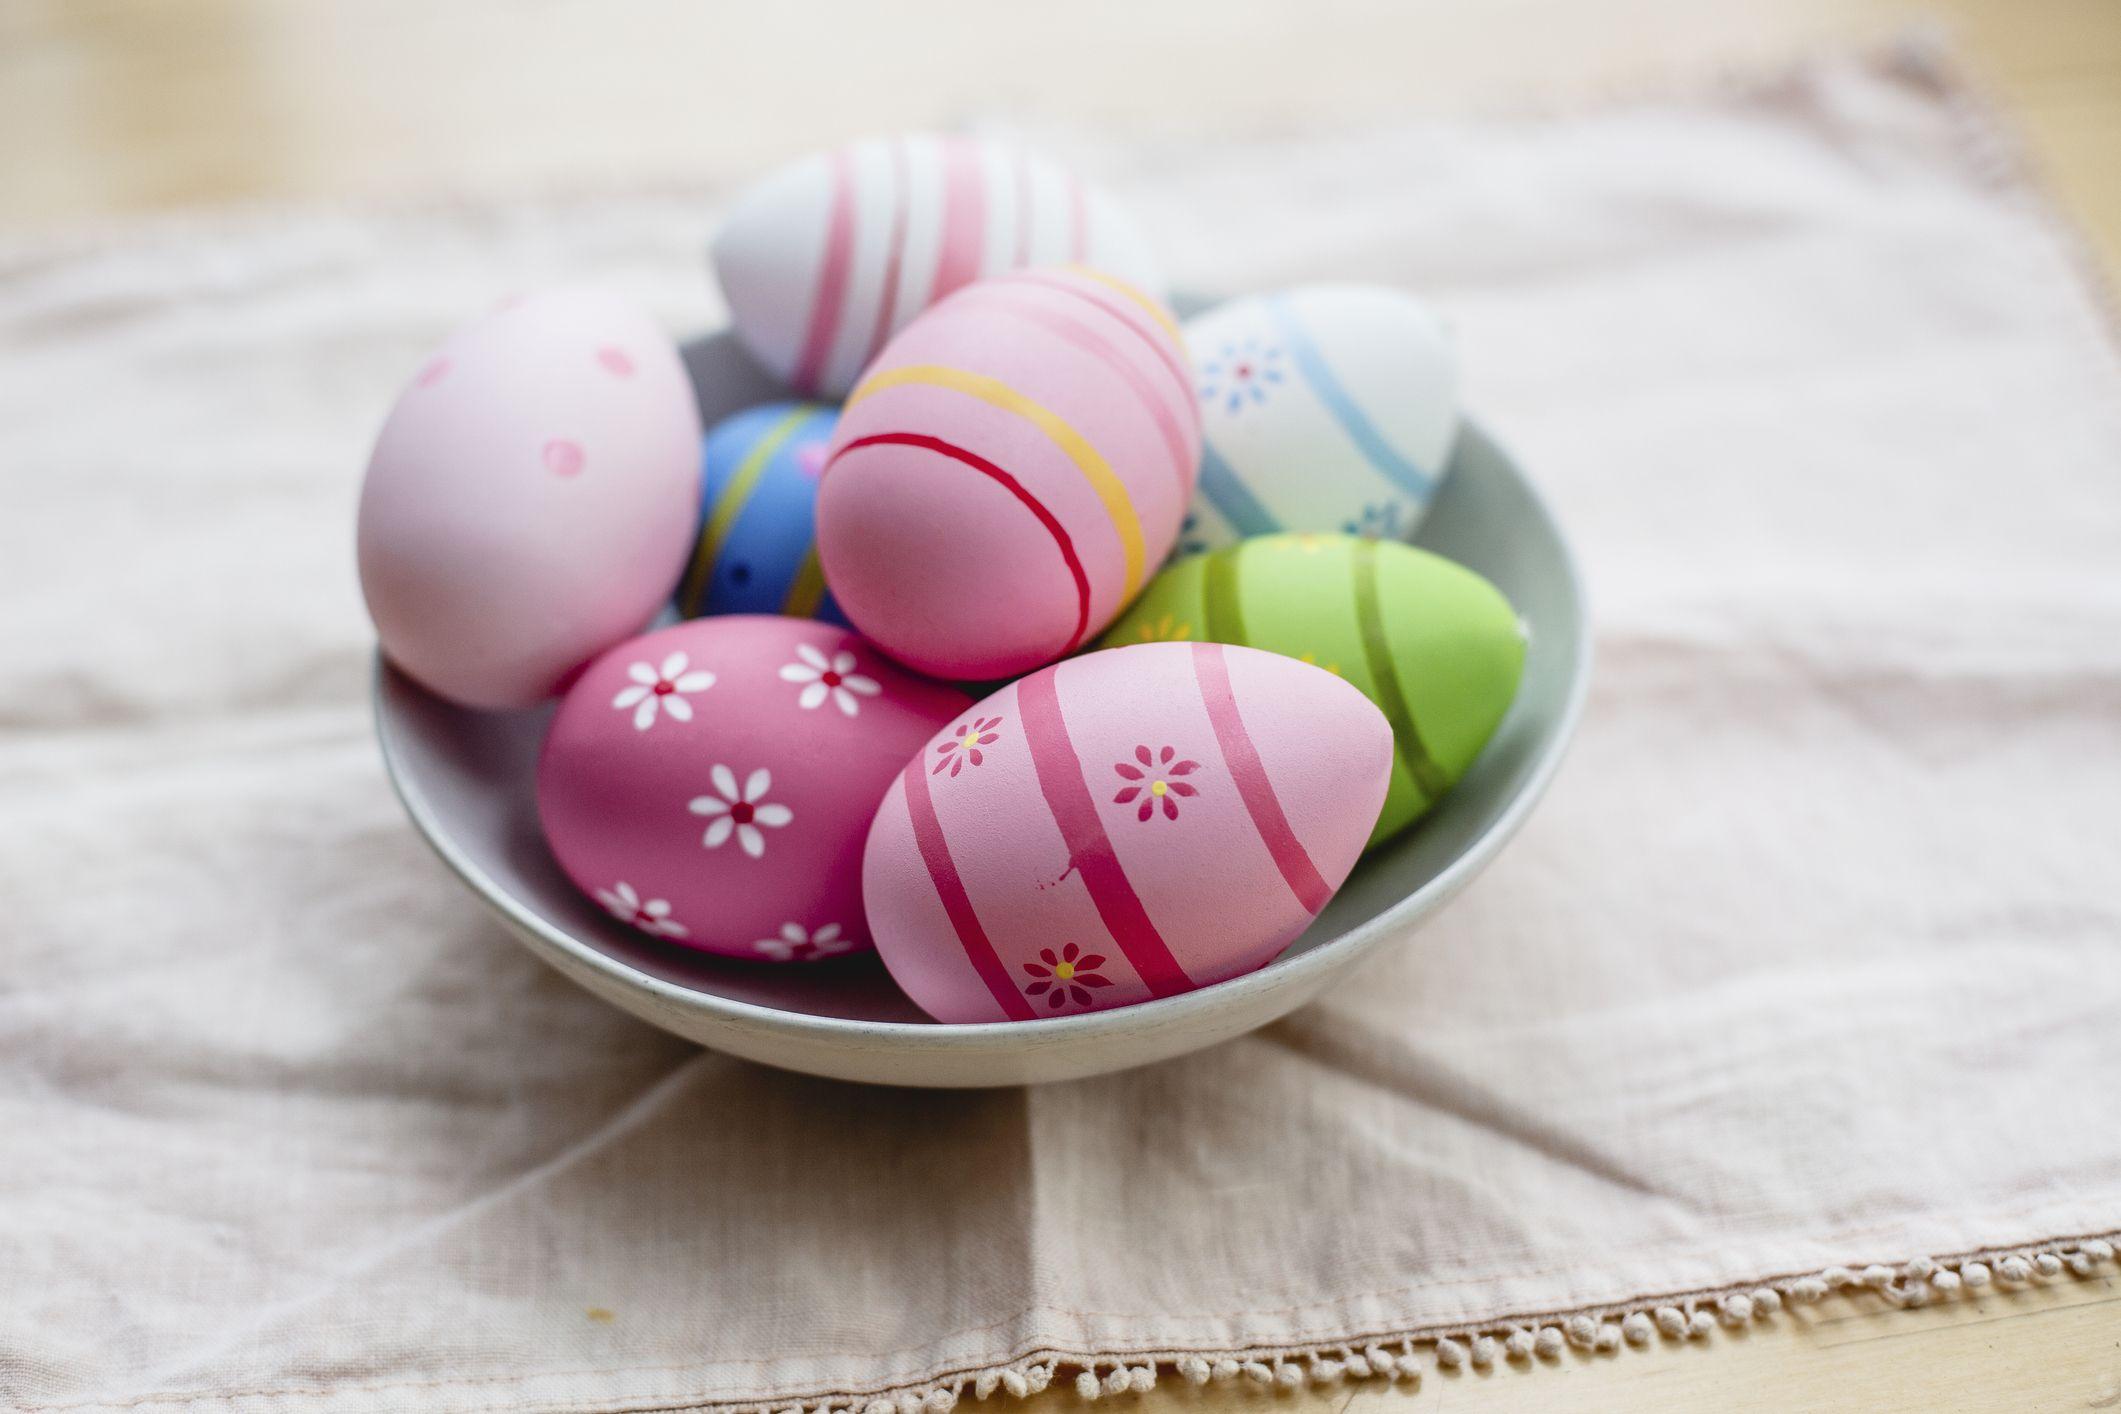 17 Easter egg decorating ideas from Pinterest